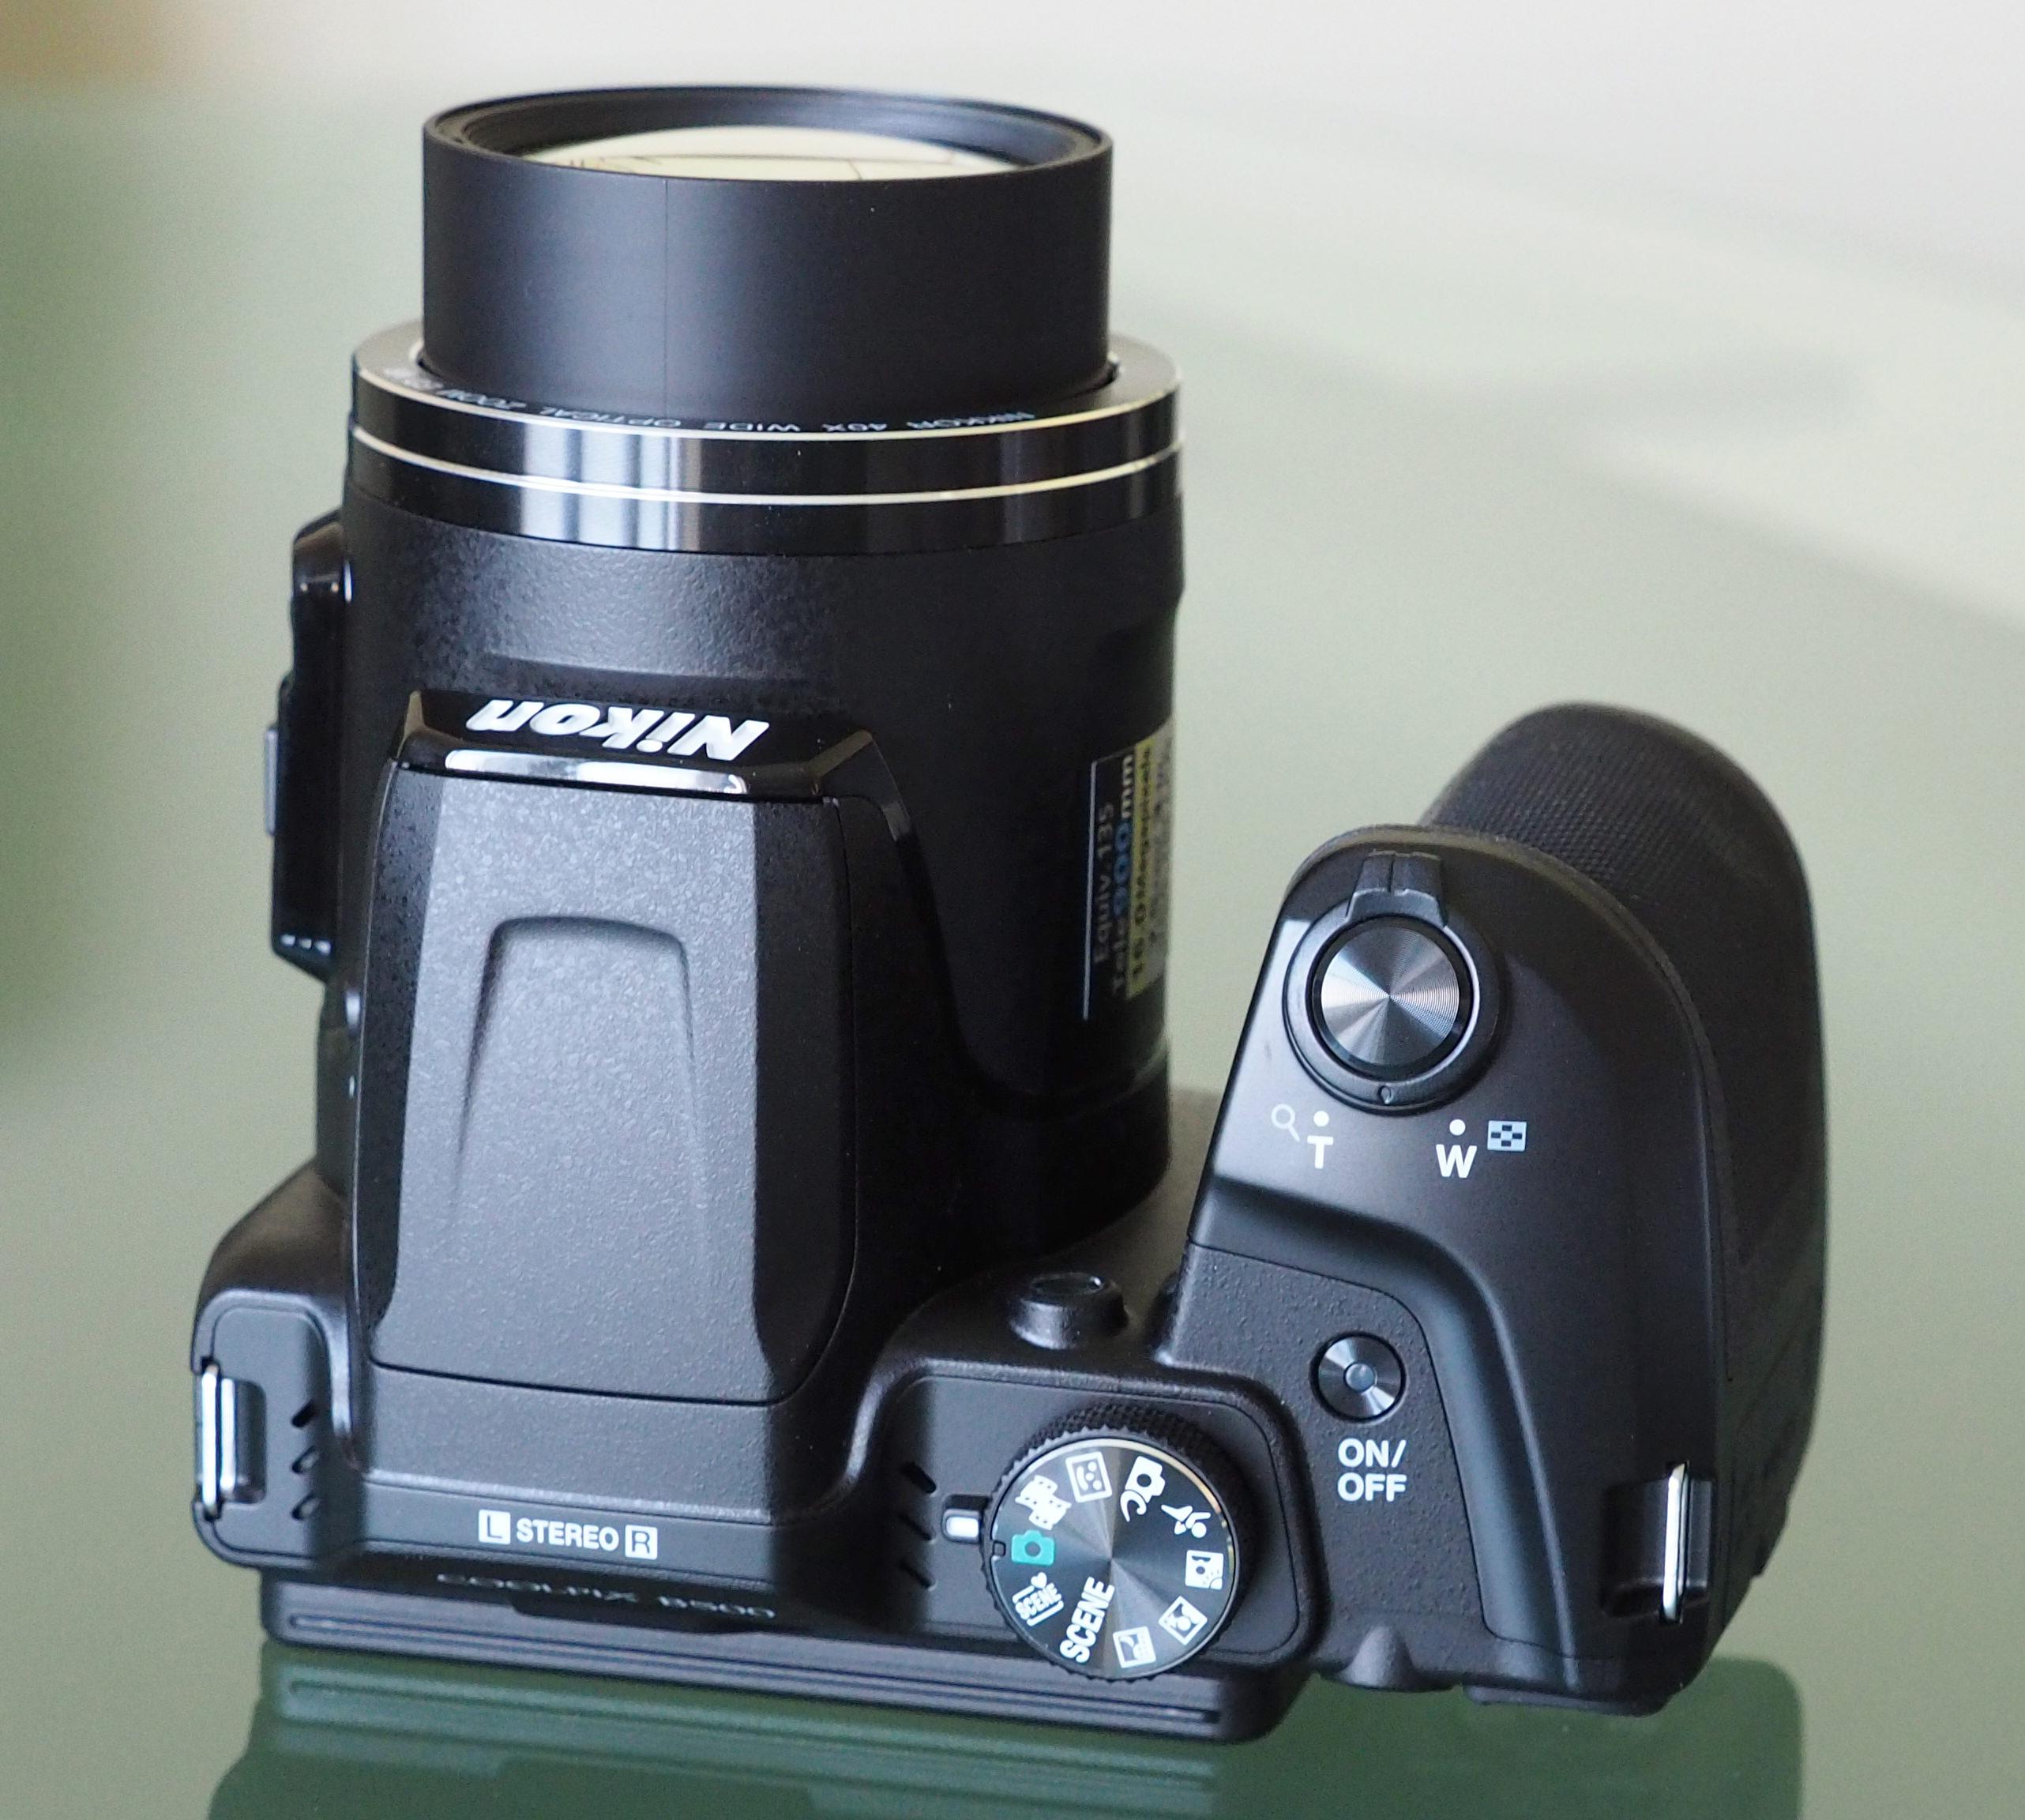 Nikon coolpix aw130 camera download instruction manual pdf.